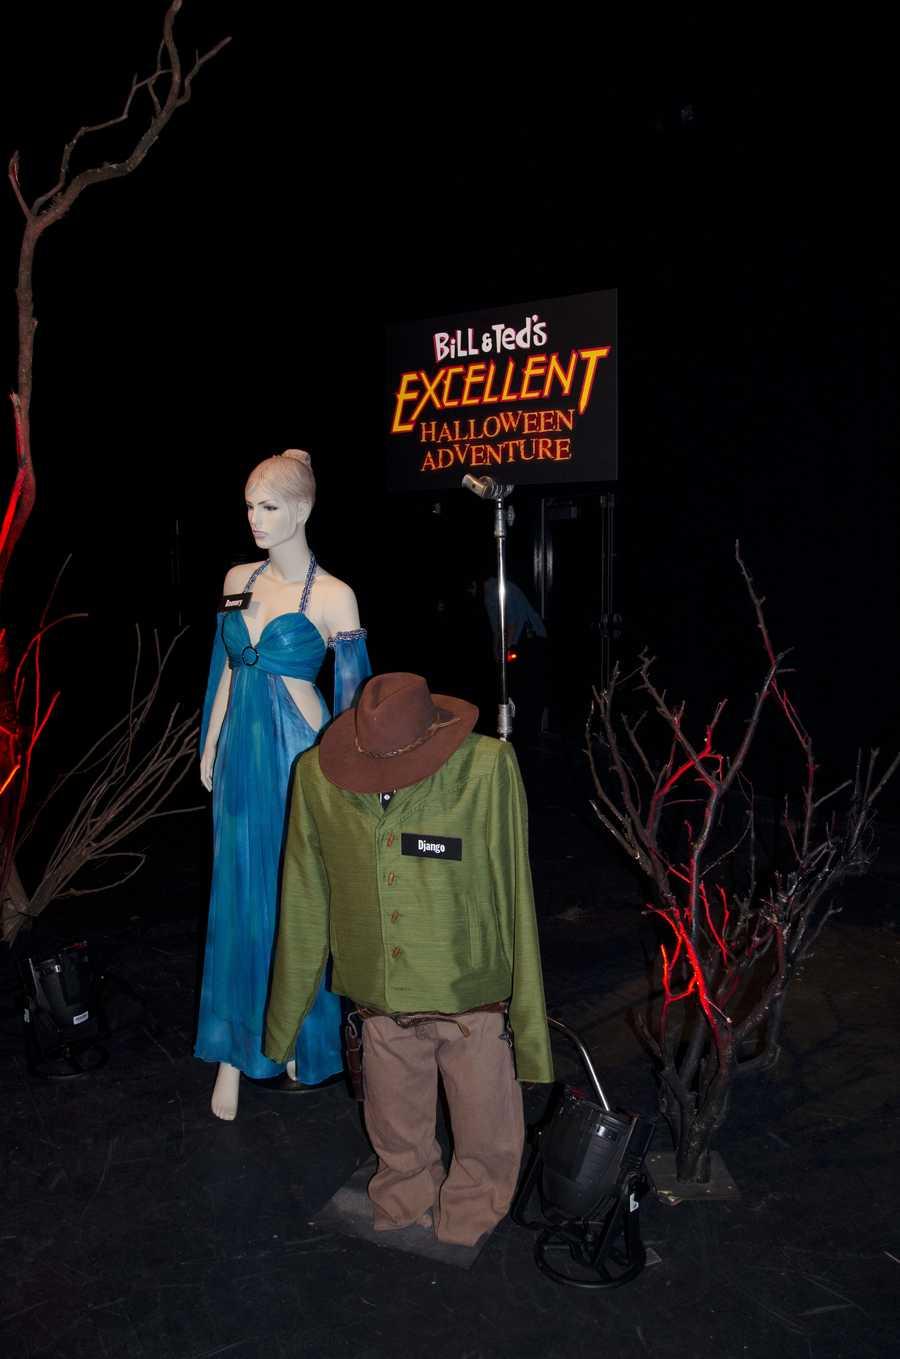 Bill & Ted's Excellent Halloween Adventure (Orlando 2013)